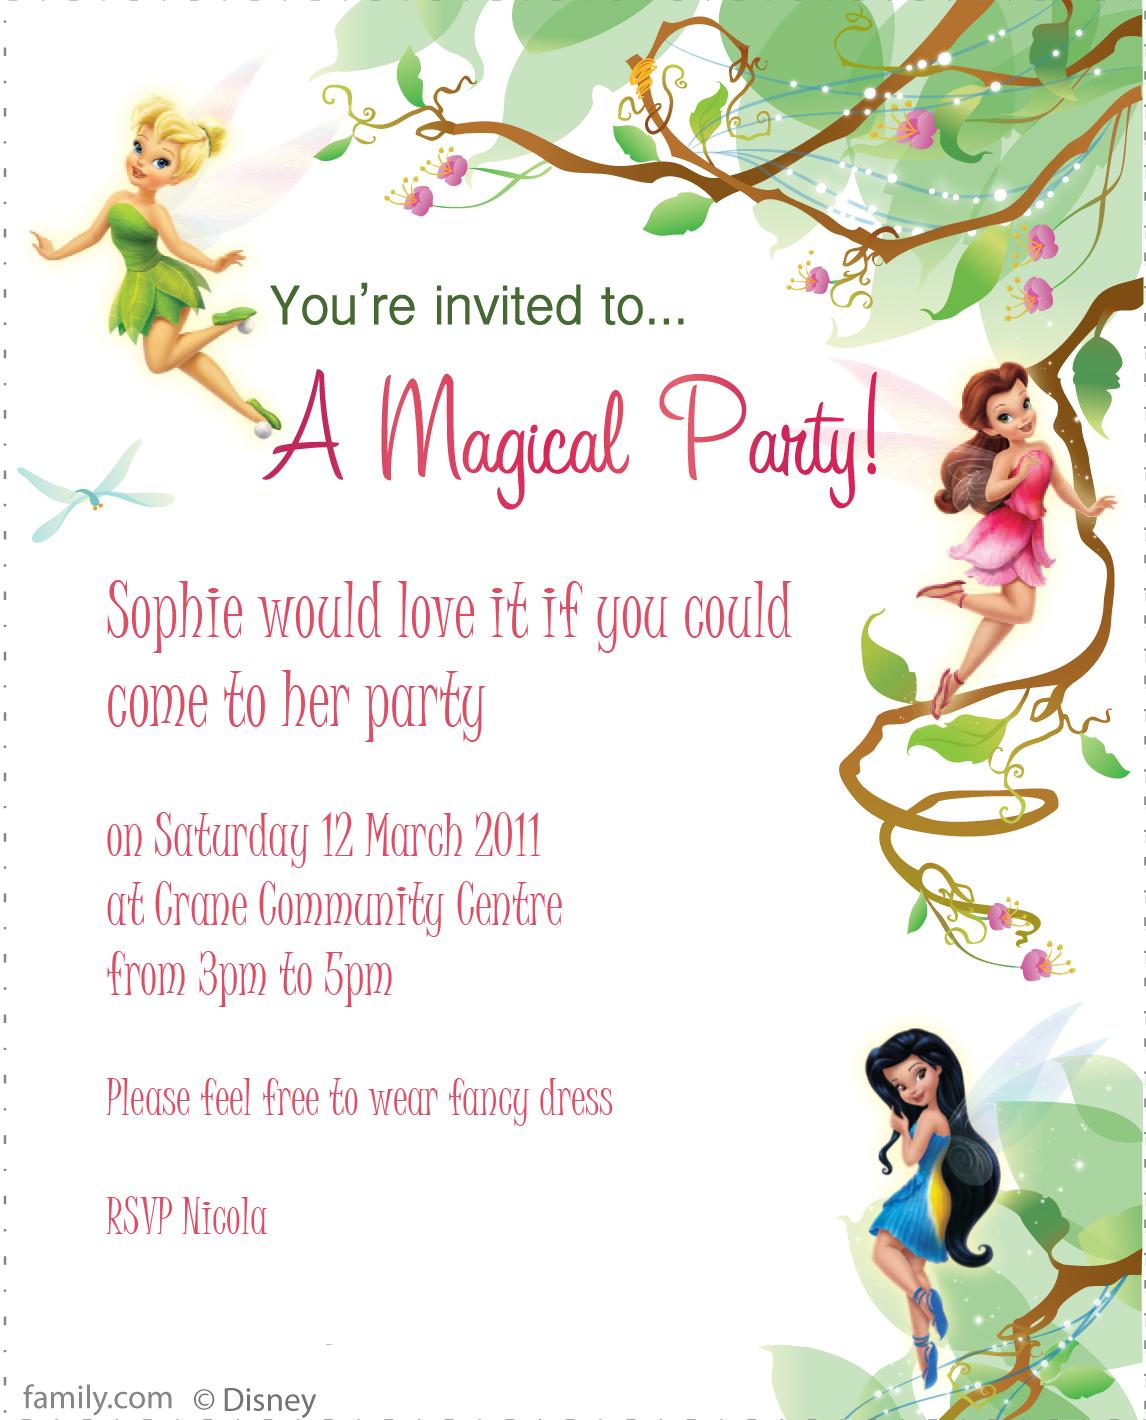 Butterfly Birthday Invitation is amazing invitations ideas